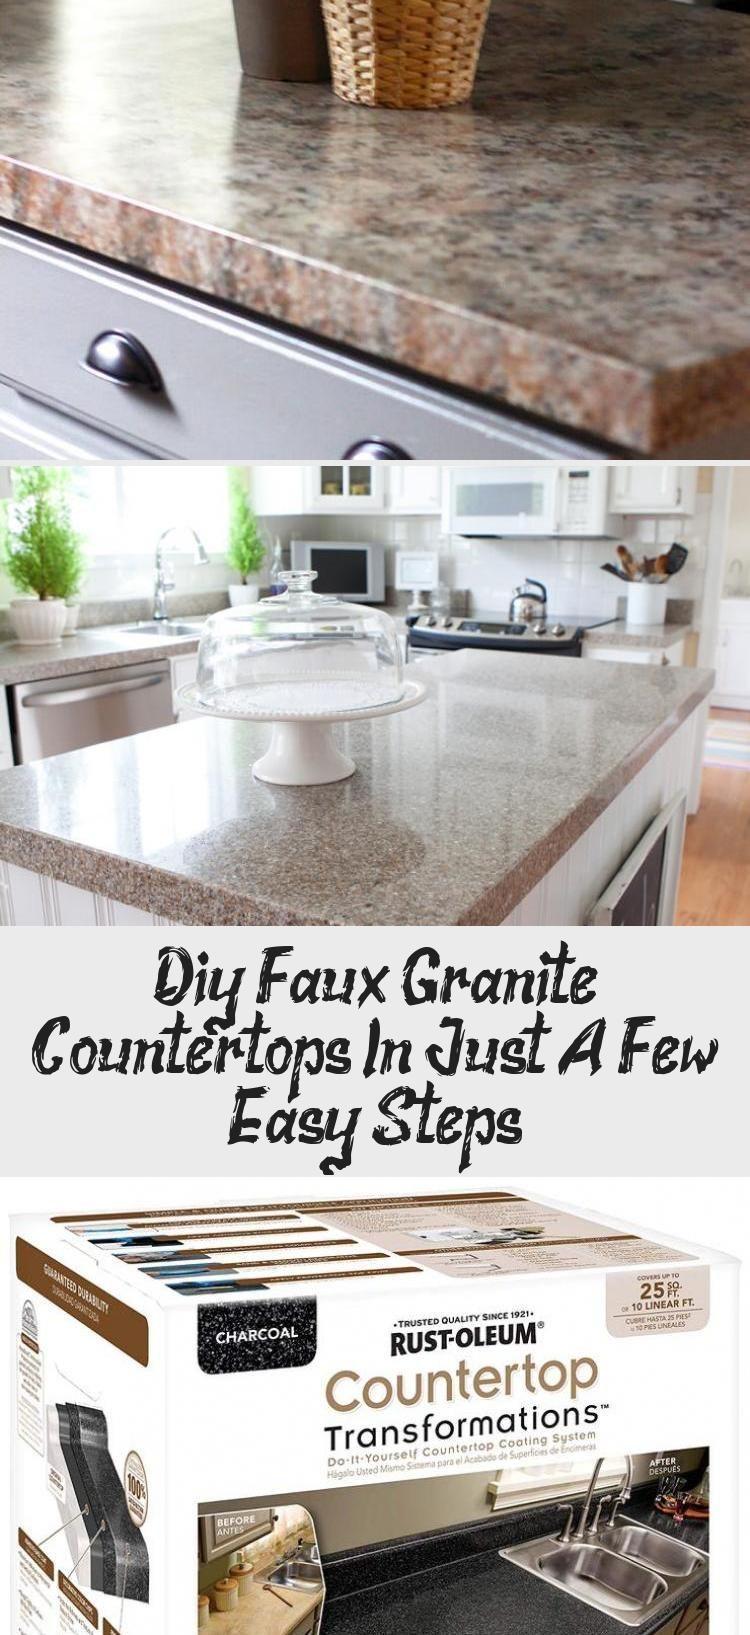 Diy Faux Granite Countertops In Just A Few Easy Steps Ktchn Fauxgranite Learn How To Make Faux Gra In 2020 Granite Countertops Faux Granite Countertops Faux Granite